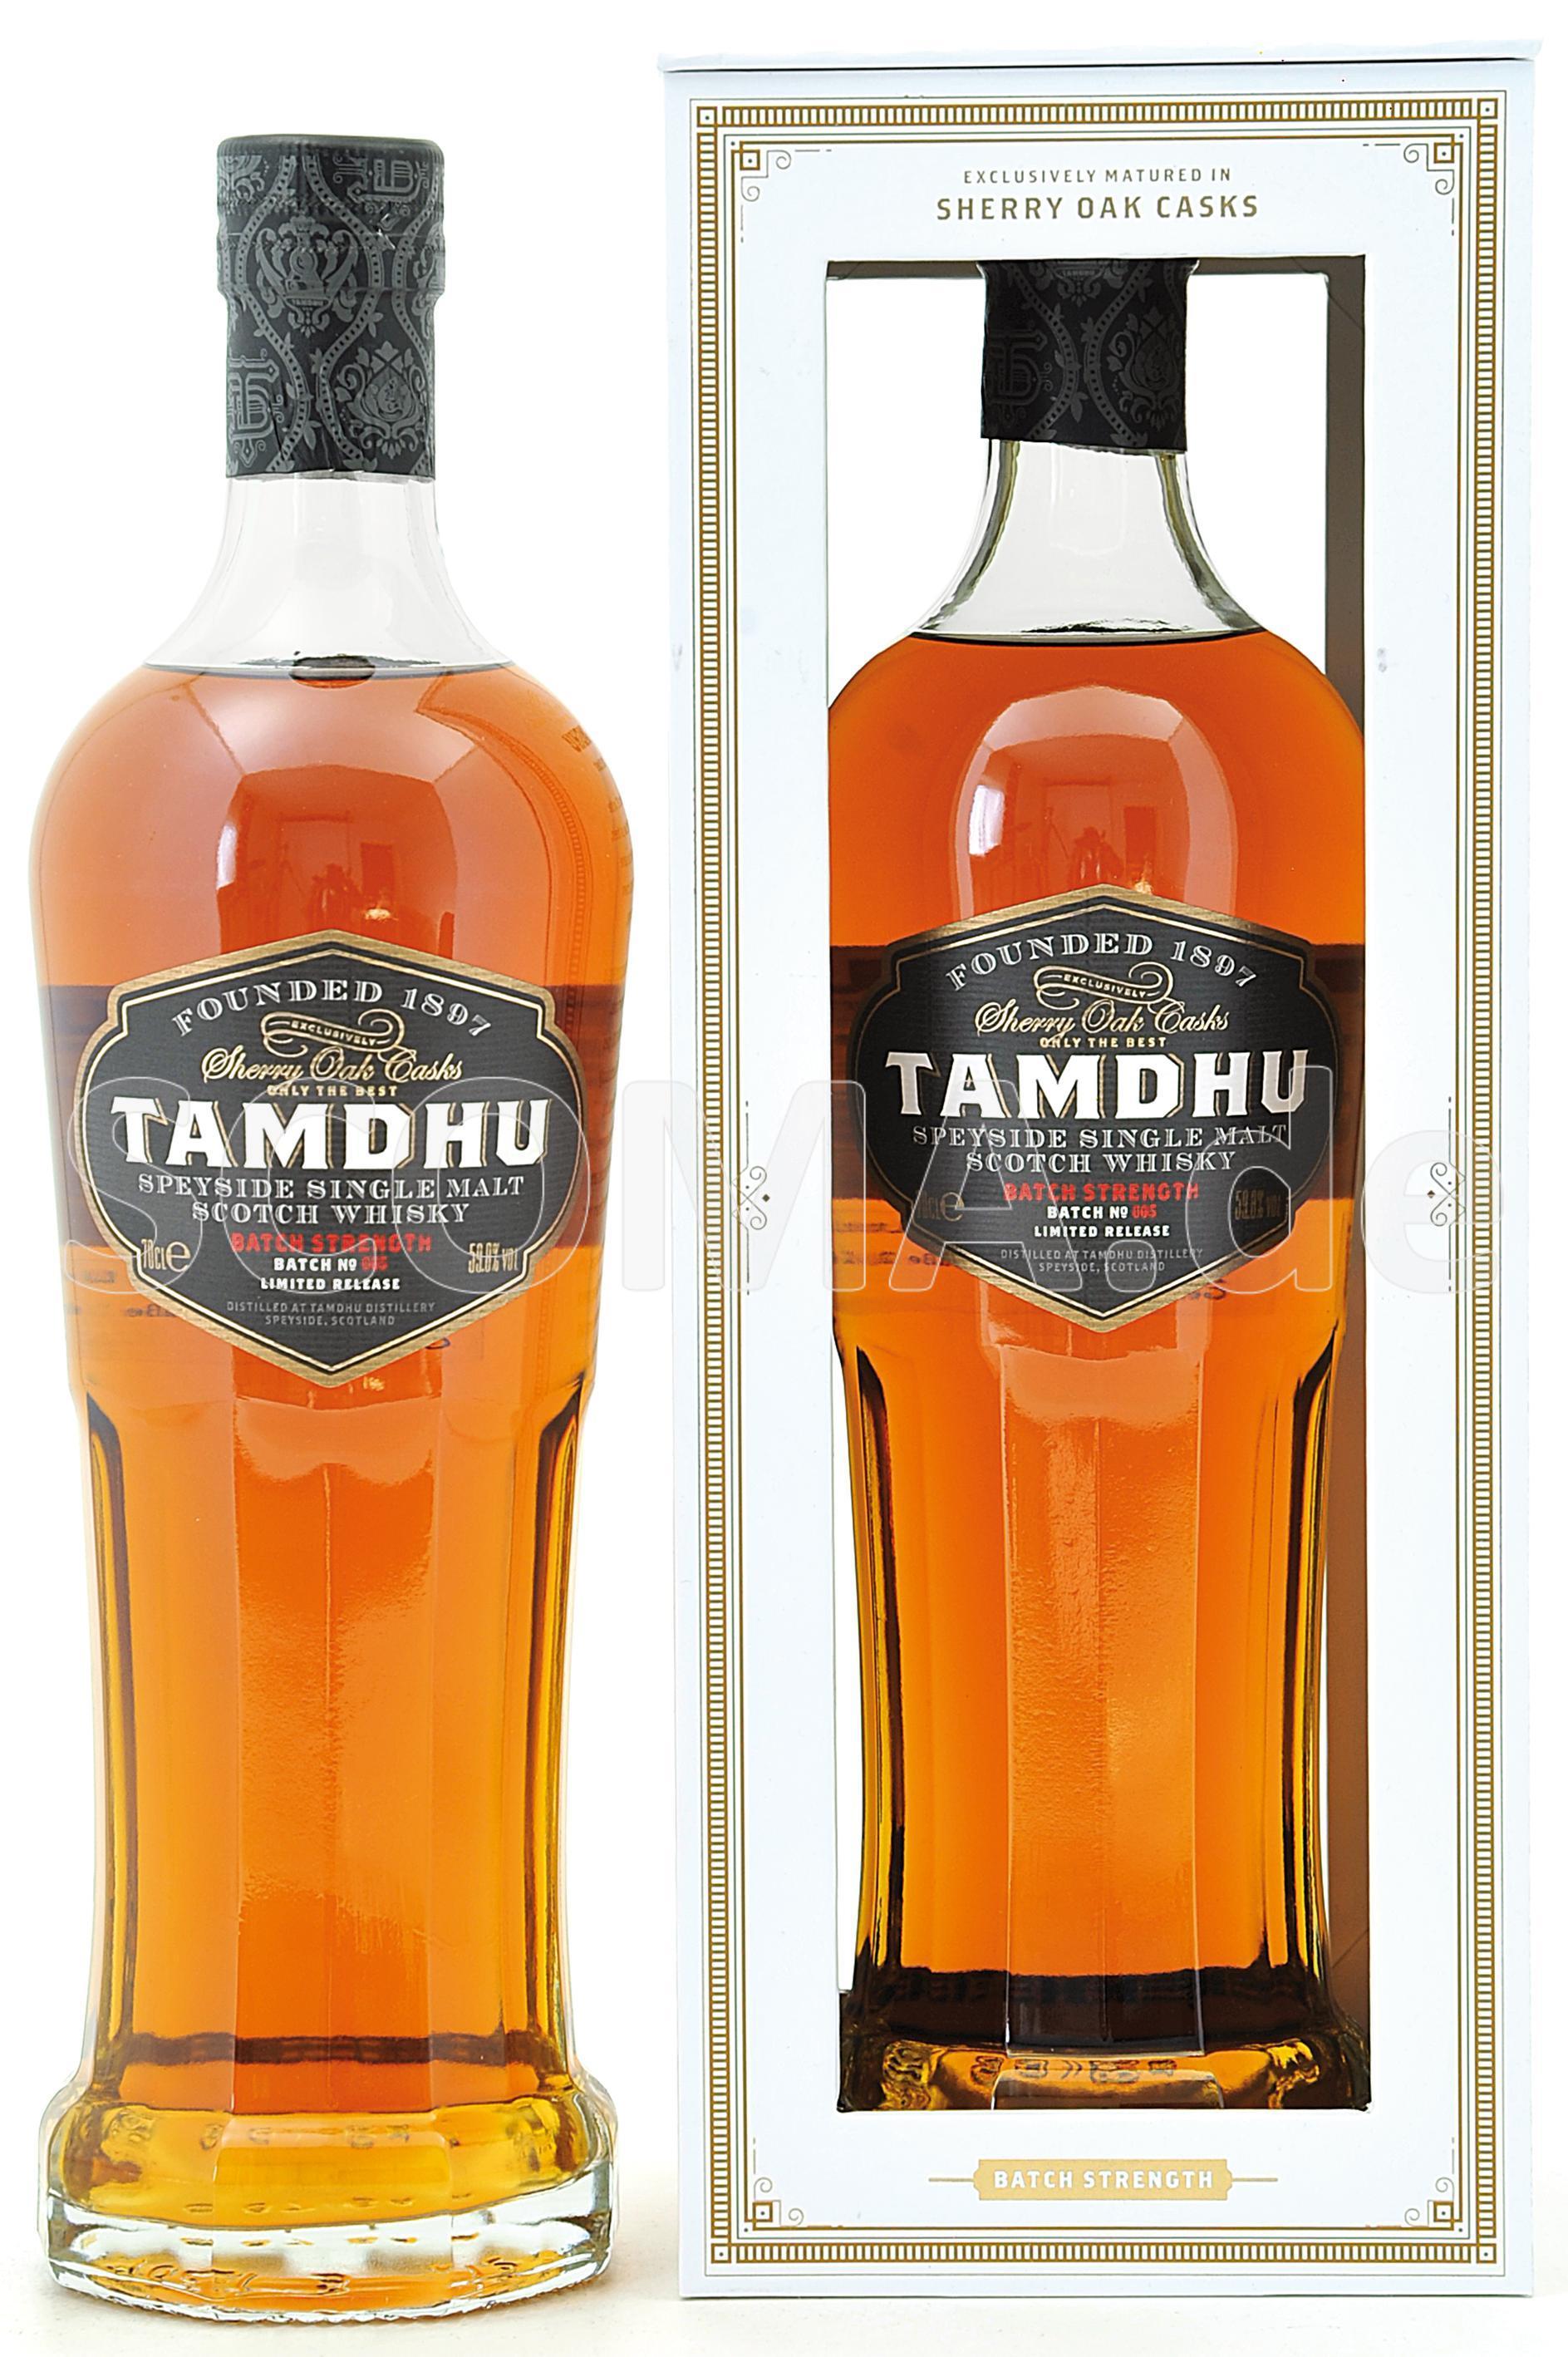 Tamdhu Cask strength